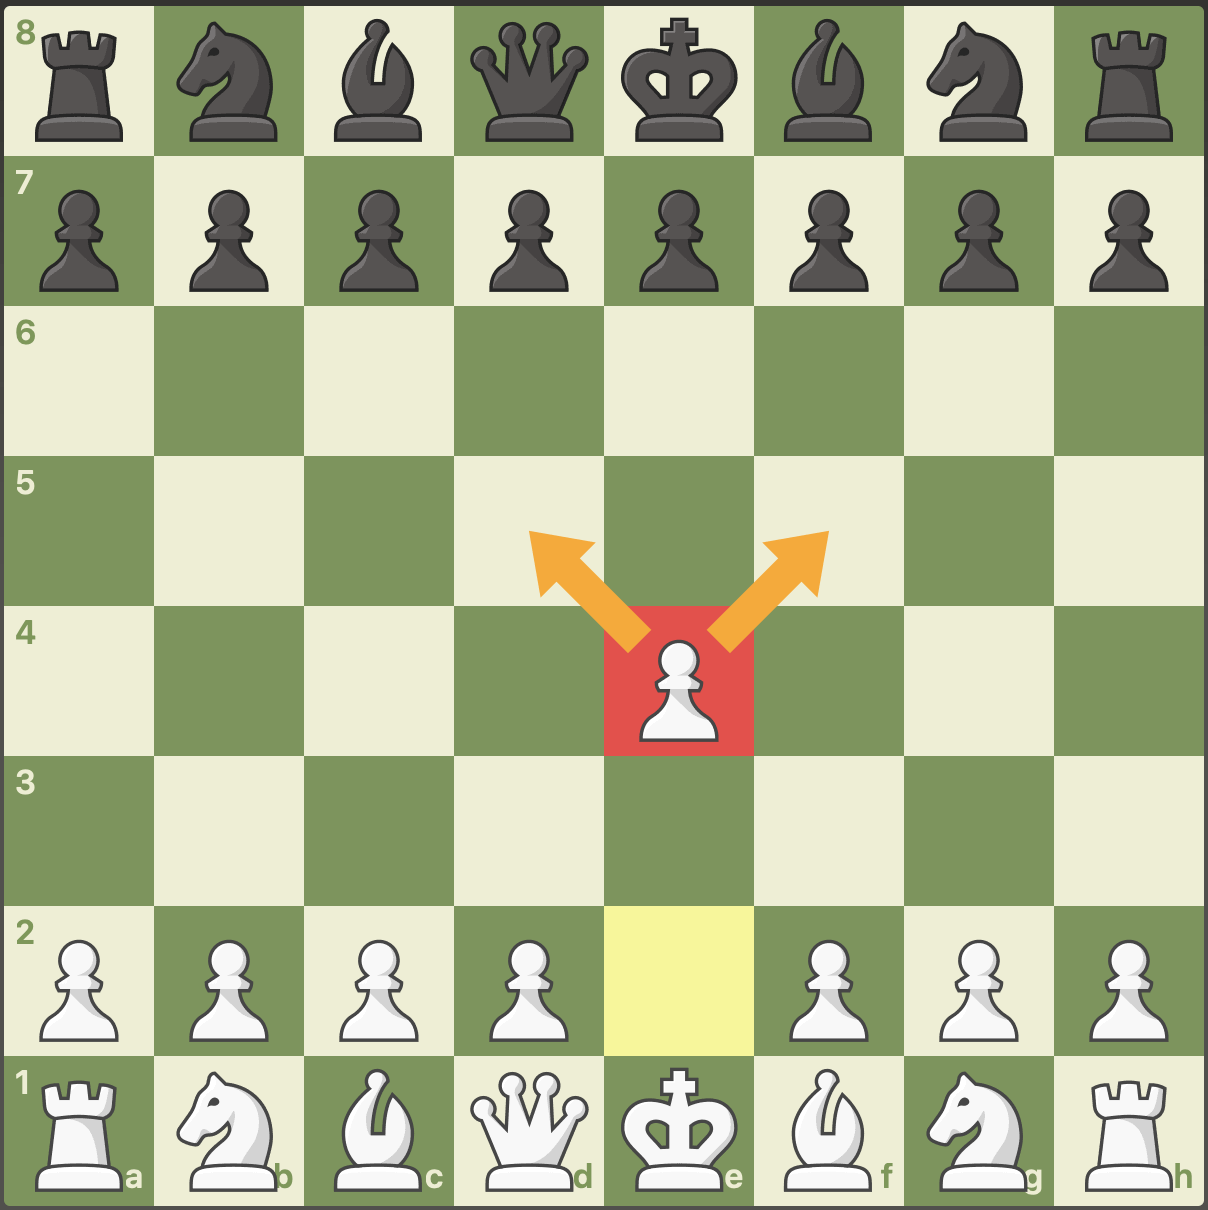 pawn captures attacks